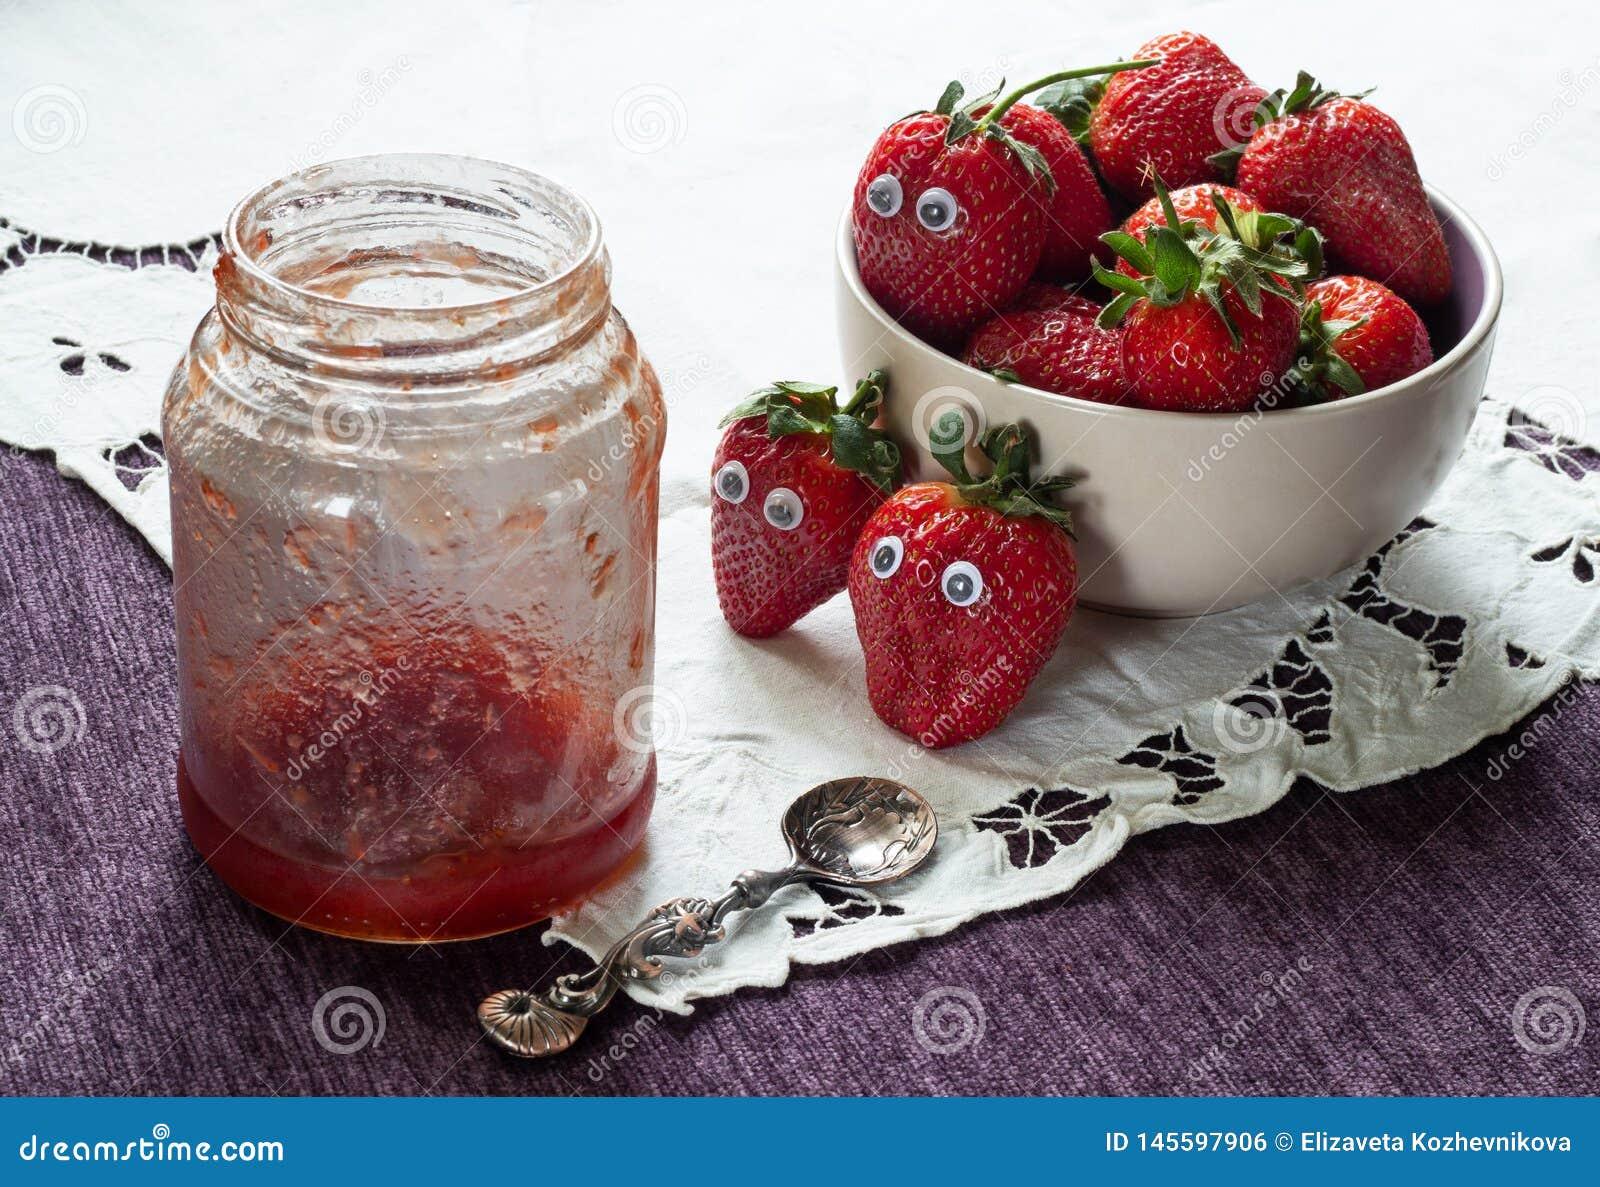 Alarming premonition of strawberries